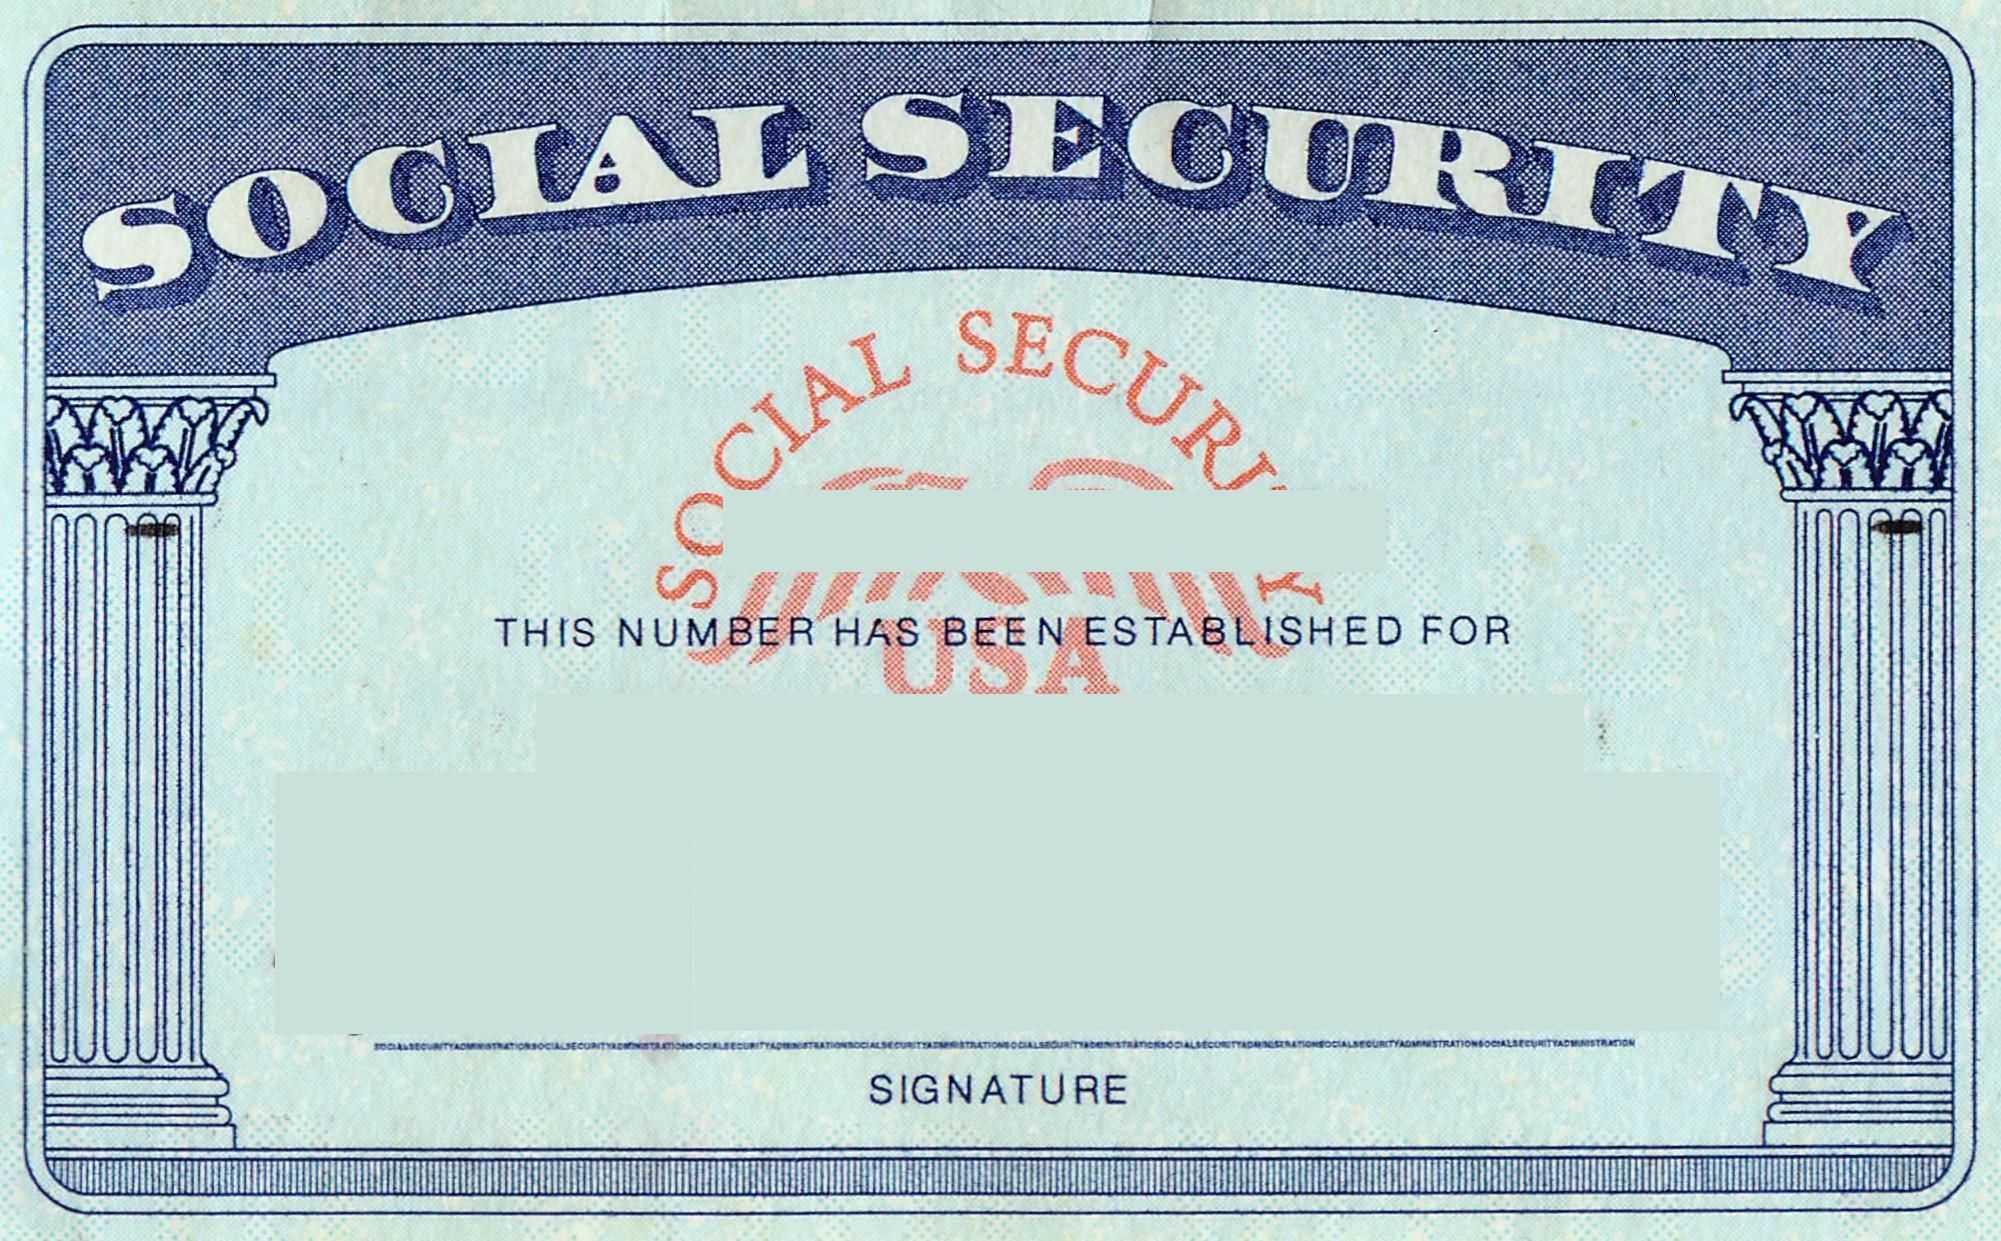 Blank Social Security Card Template | Social Security Card Intended For Blank Social Security Card Template